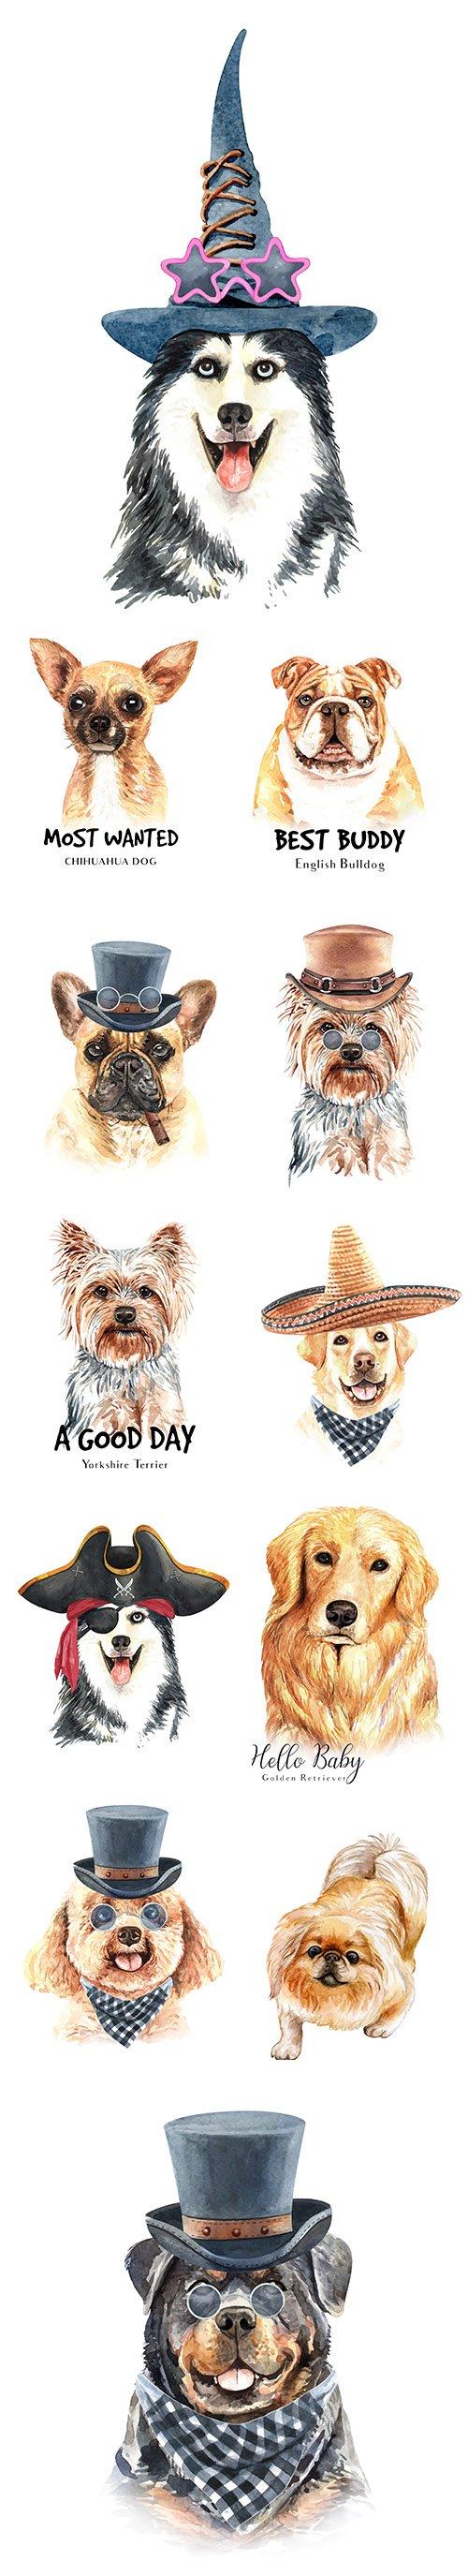 Watercolor Printing Animals Vol 5